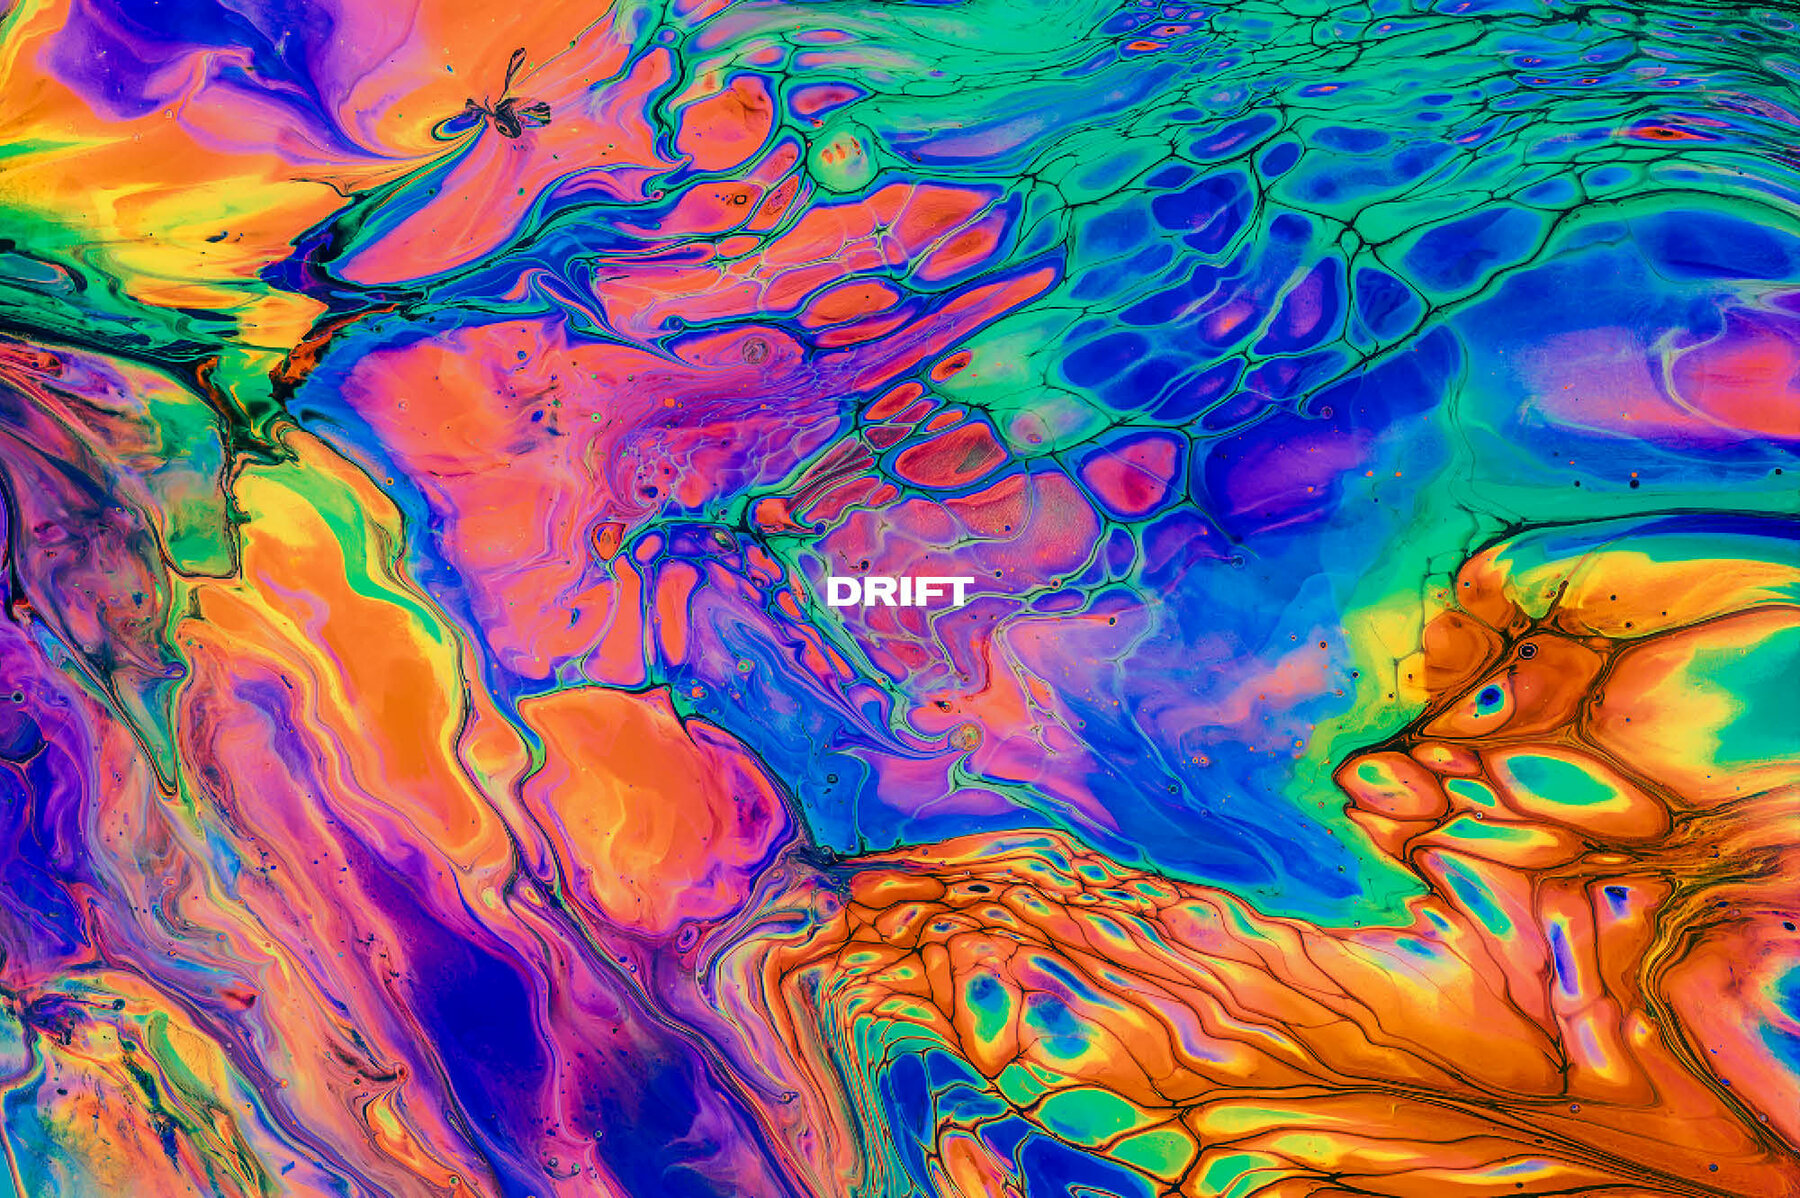 Drift     Abstract Paint Textures